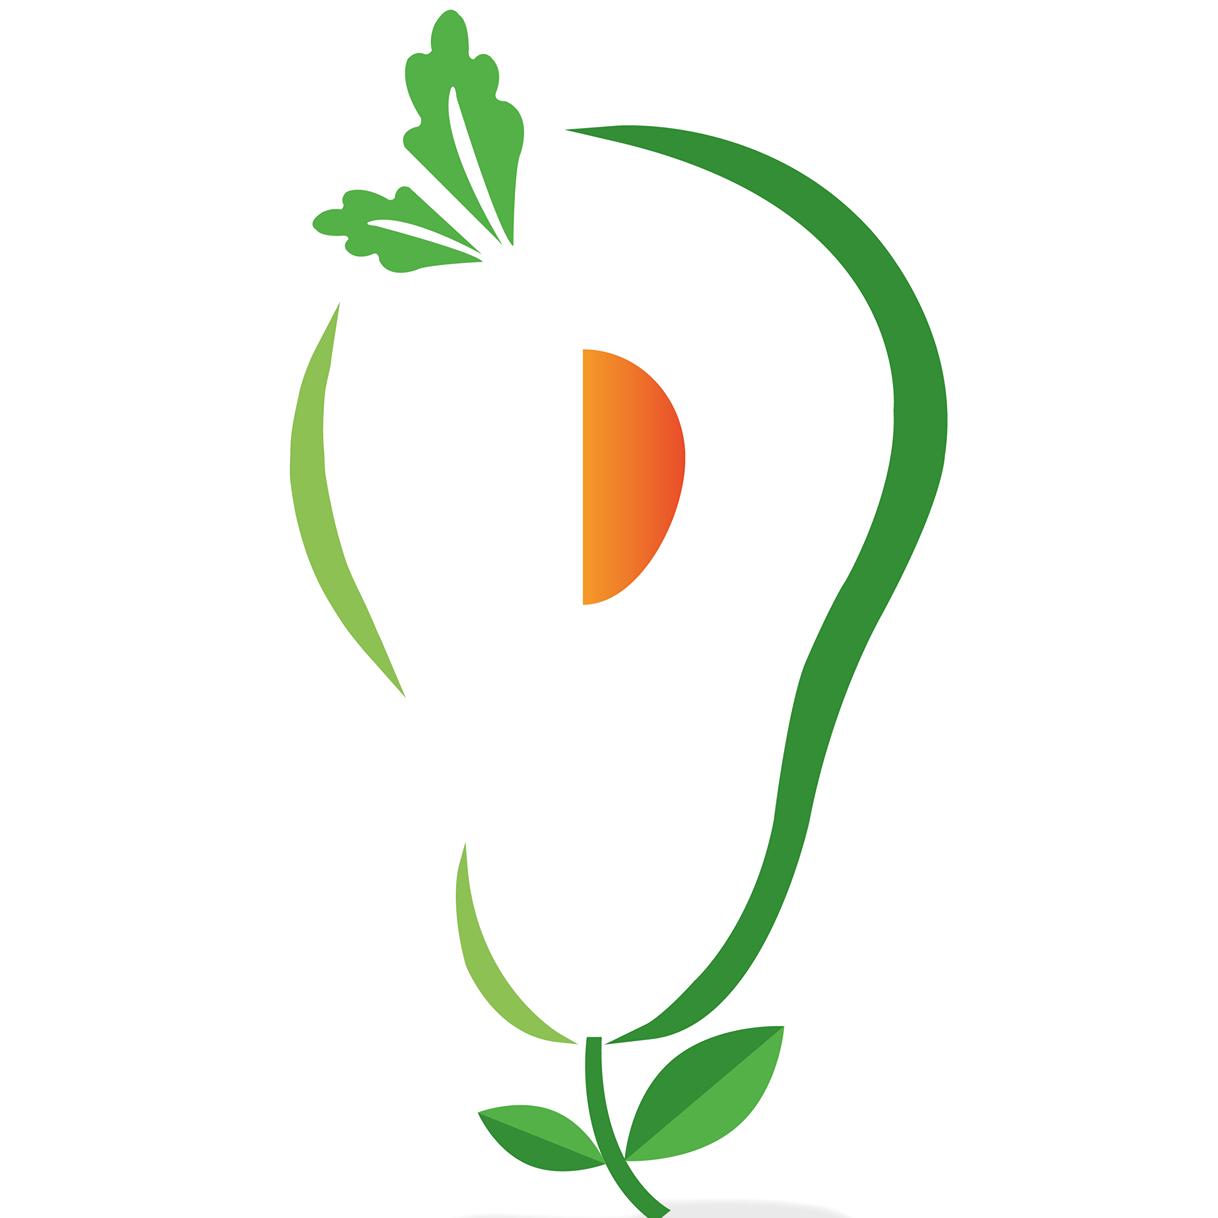 تطبيق ڤجيتا Vegeta App